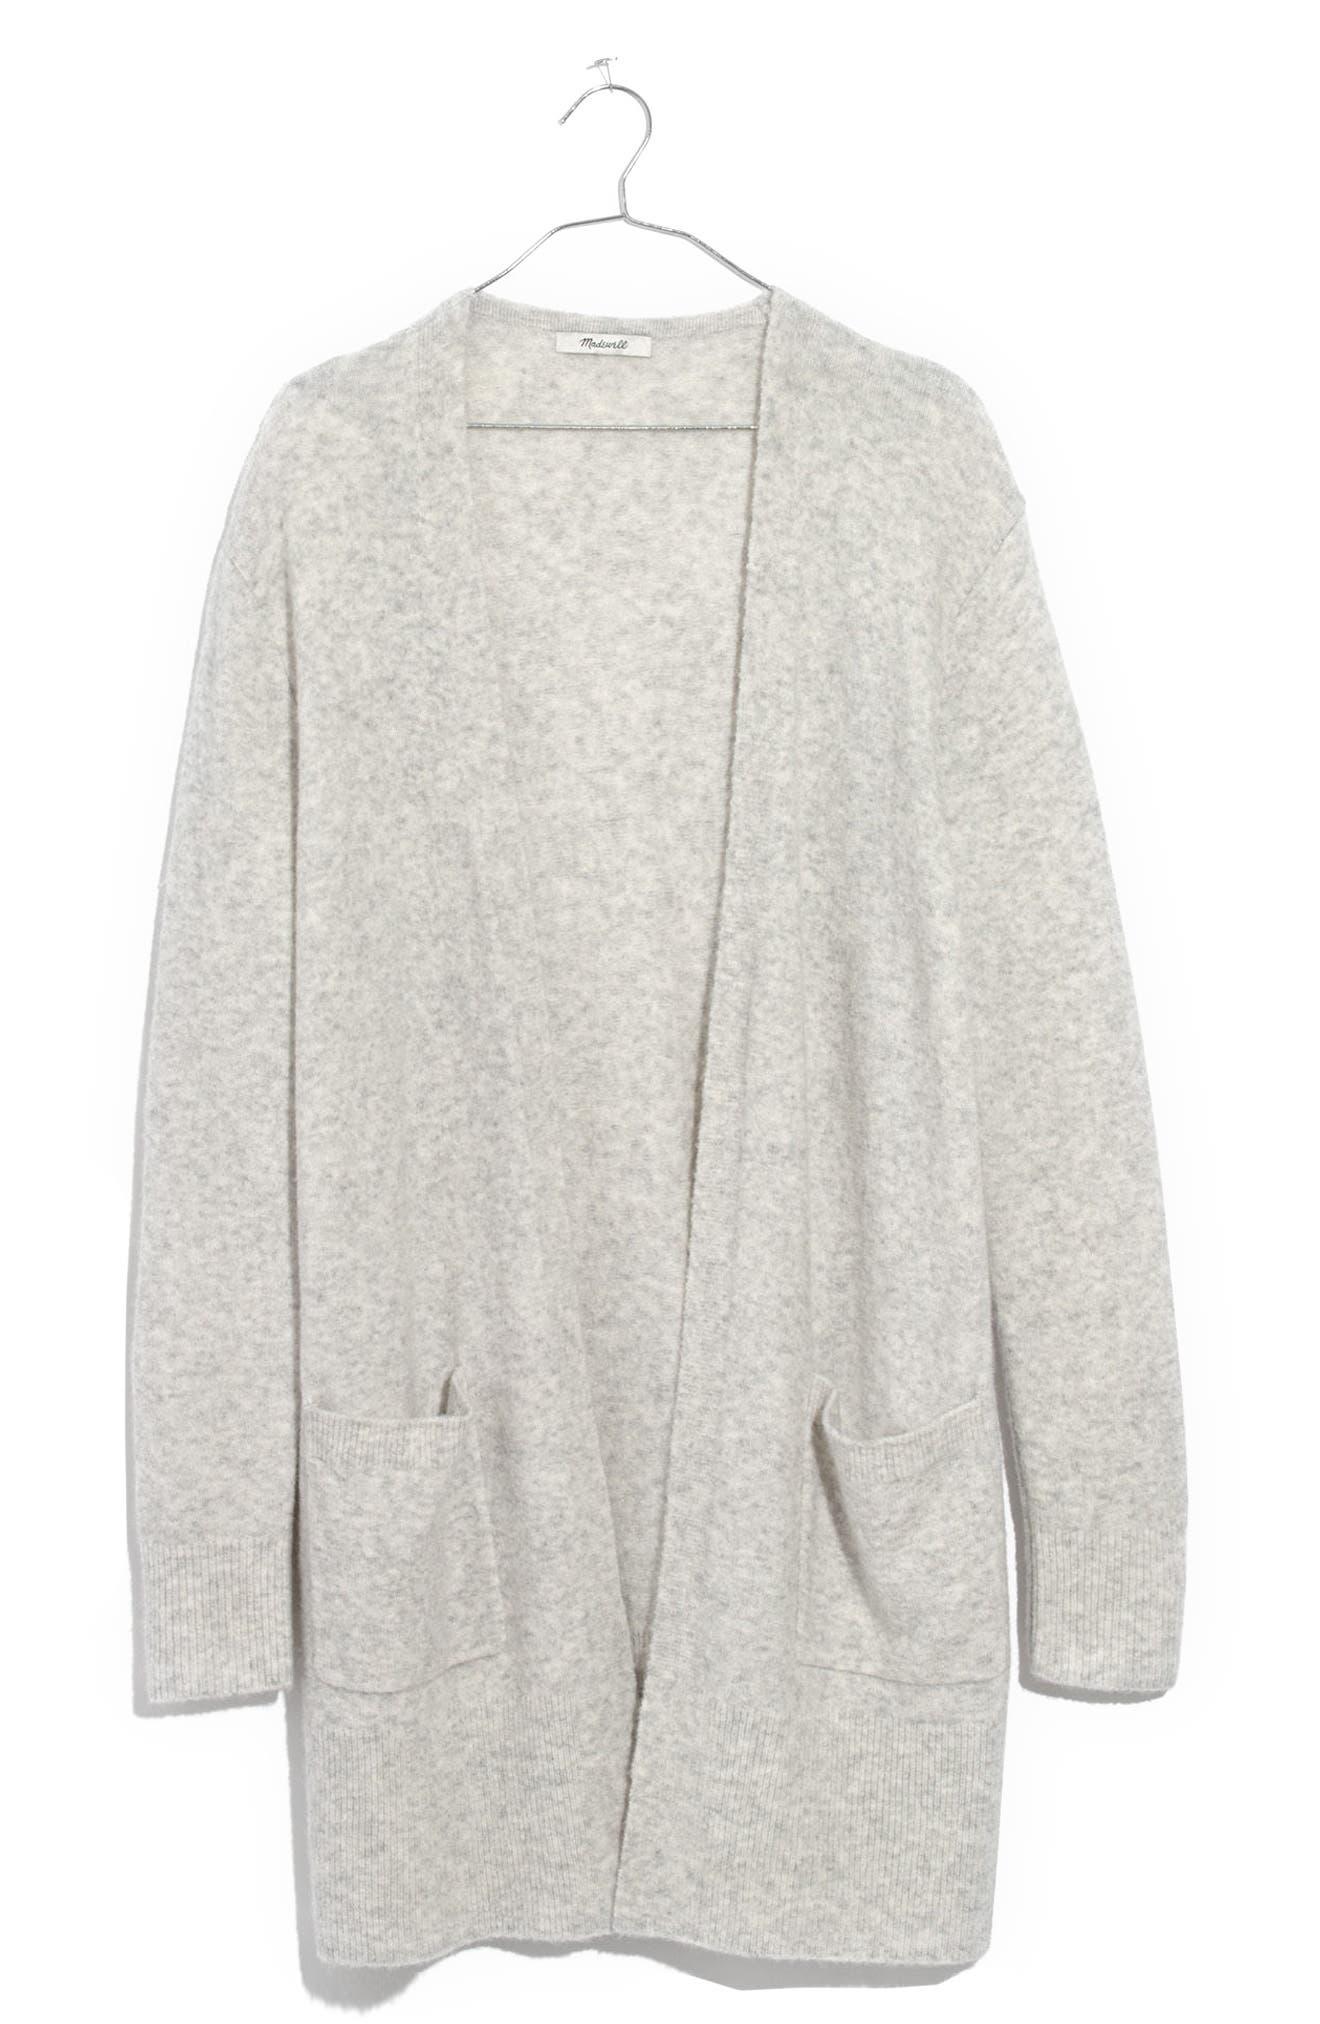 Kent Cardigan Sweater,                         Main,                         color, Heather Fog